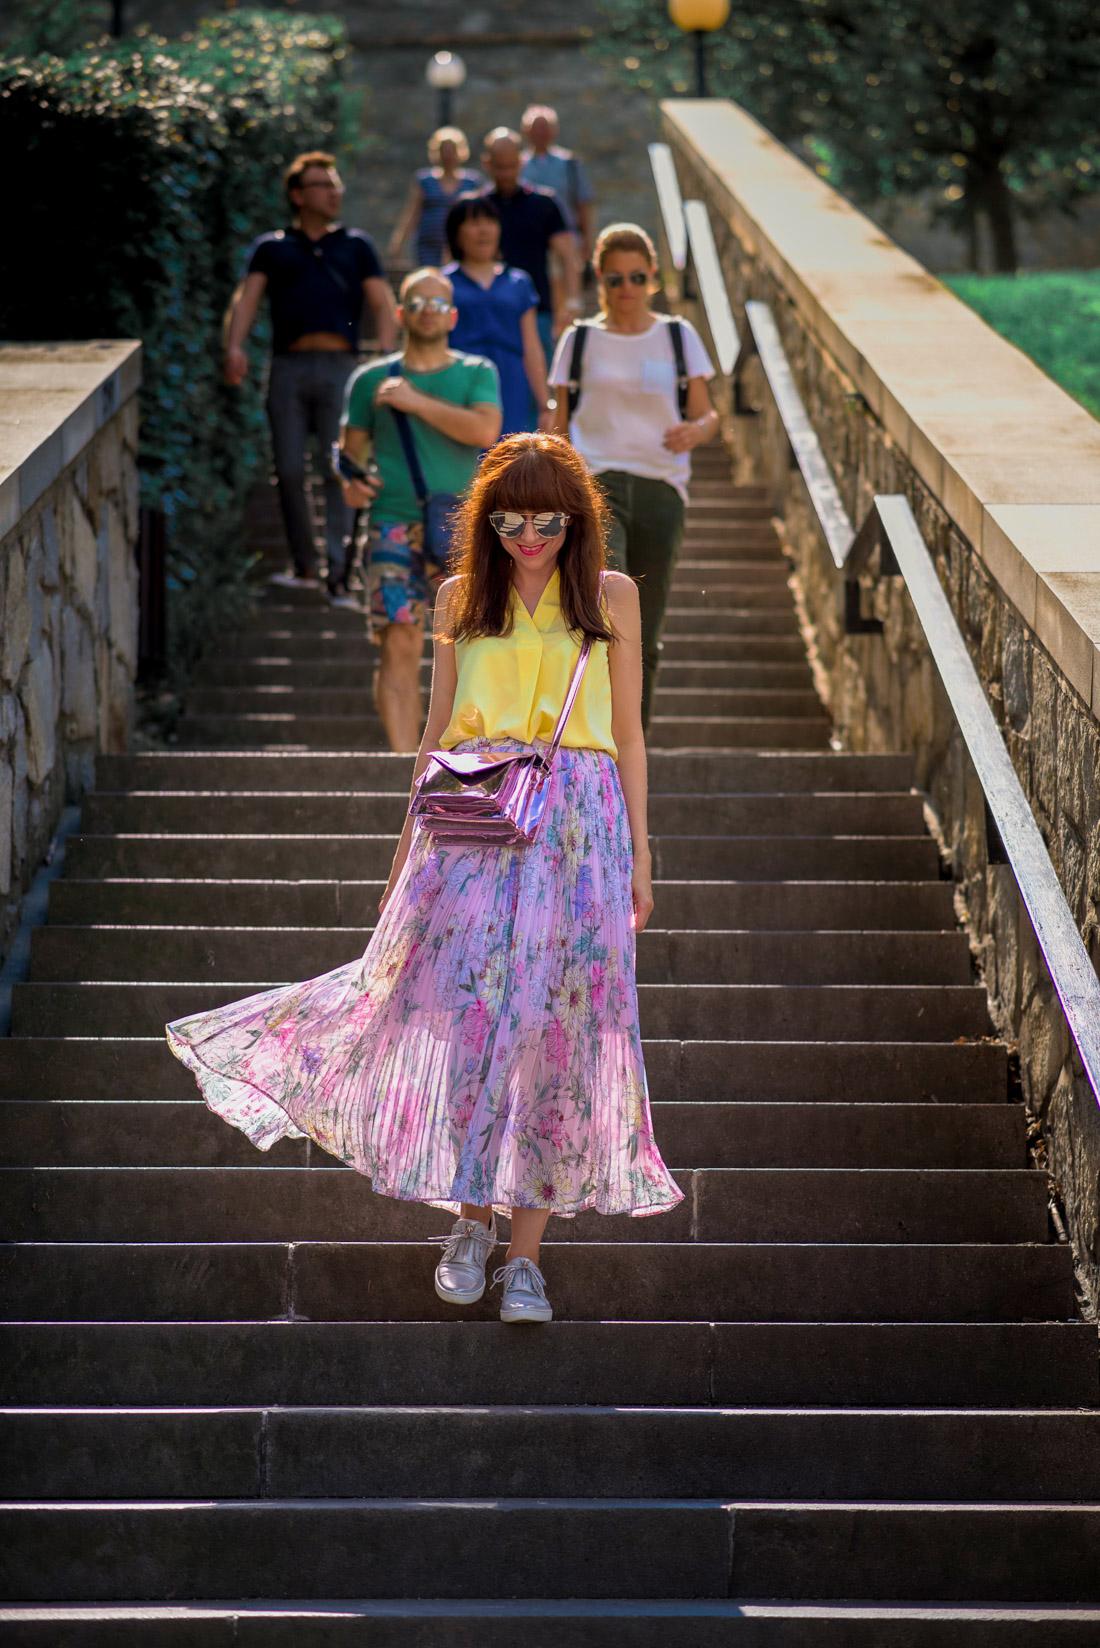 SUKŇA, KTORÁ VÁM VYRAZÍ DYCH_Katharine-fashion is beautiful_blog 10_Kvetinová plisovaná sukňa_Pastelové farby_Kabelka od Answear_Katarína Jakubčová_Fashion blogerka